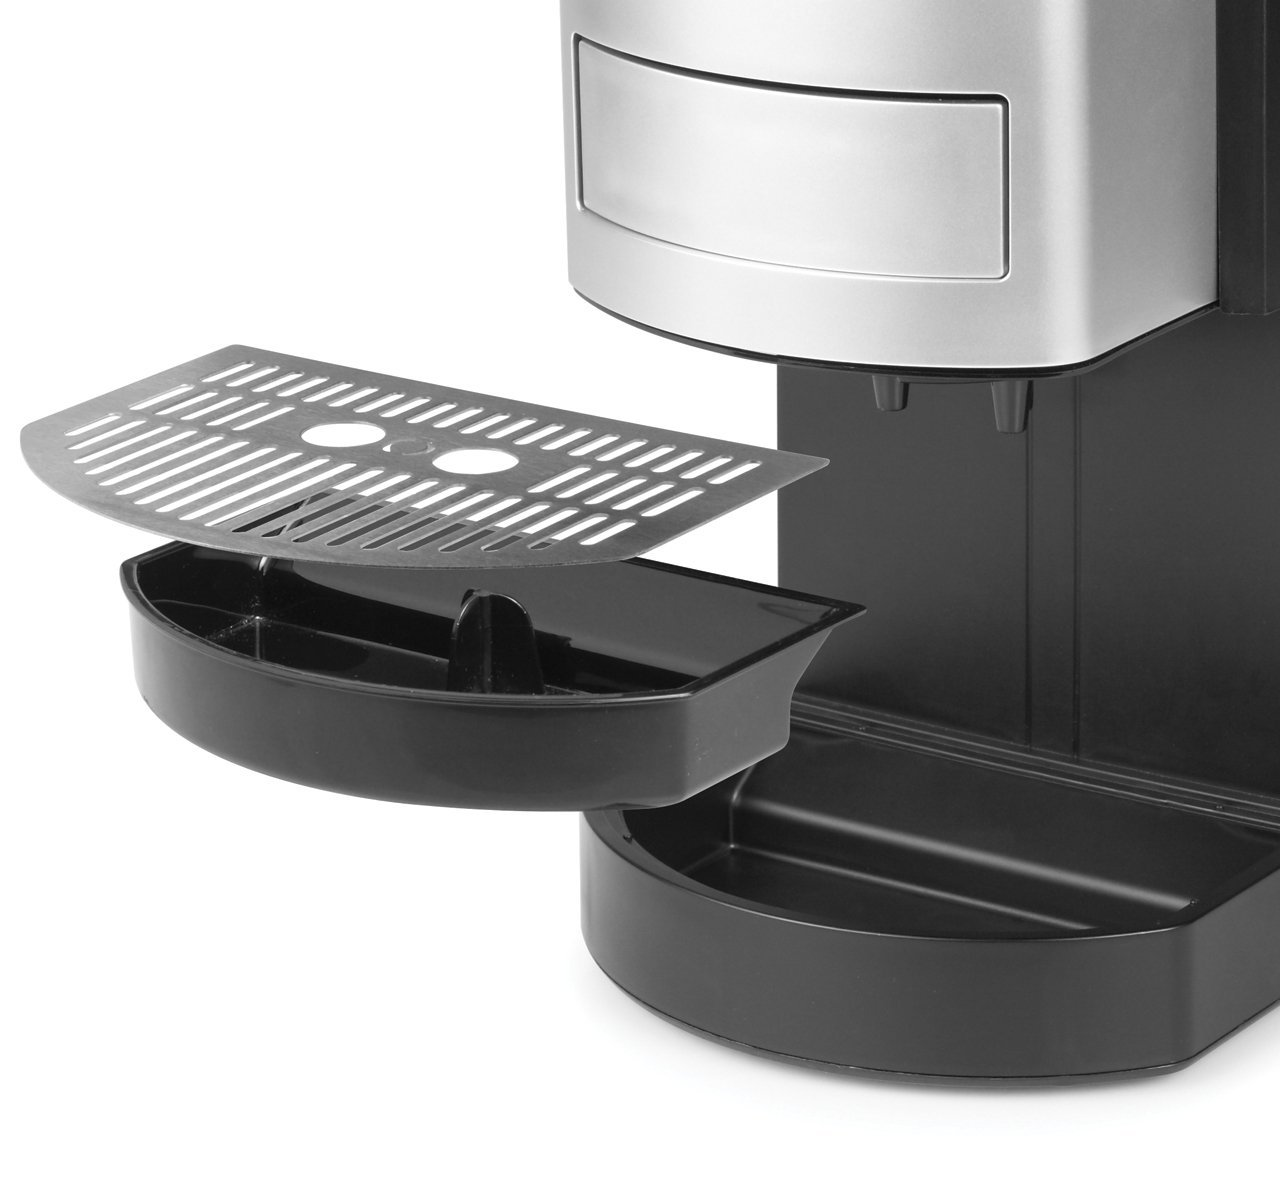 petra electric km caf pad automate pad capsule syst me kaffeepad automate sc ebay. Black Bedroom Furniture Sets. Home Design Ideas